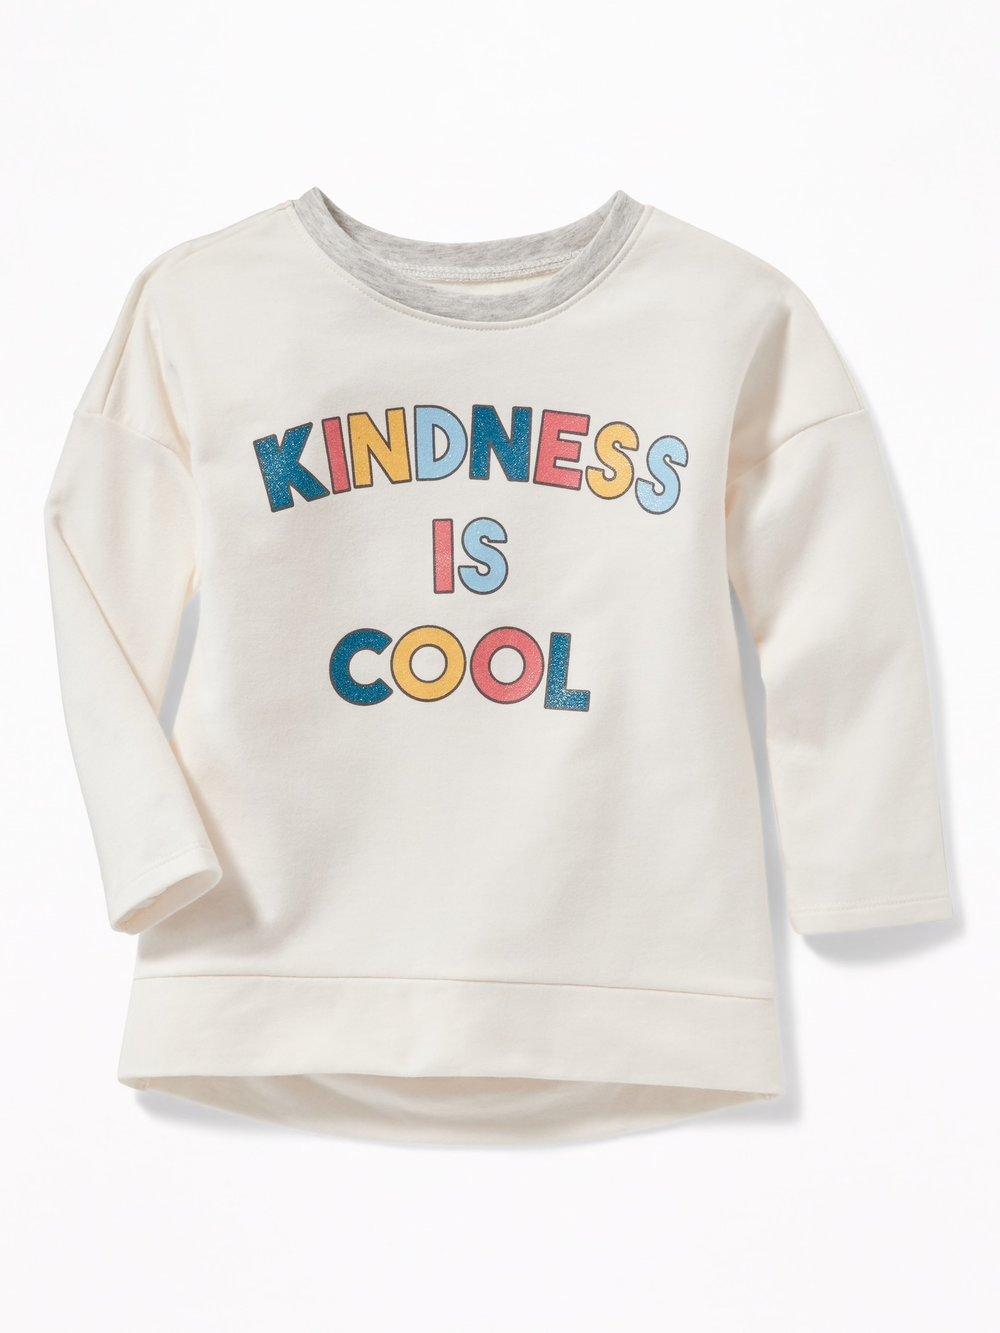 kindness is cool sweatshirt.jpg